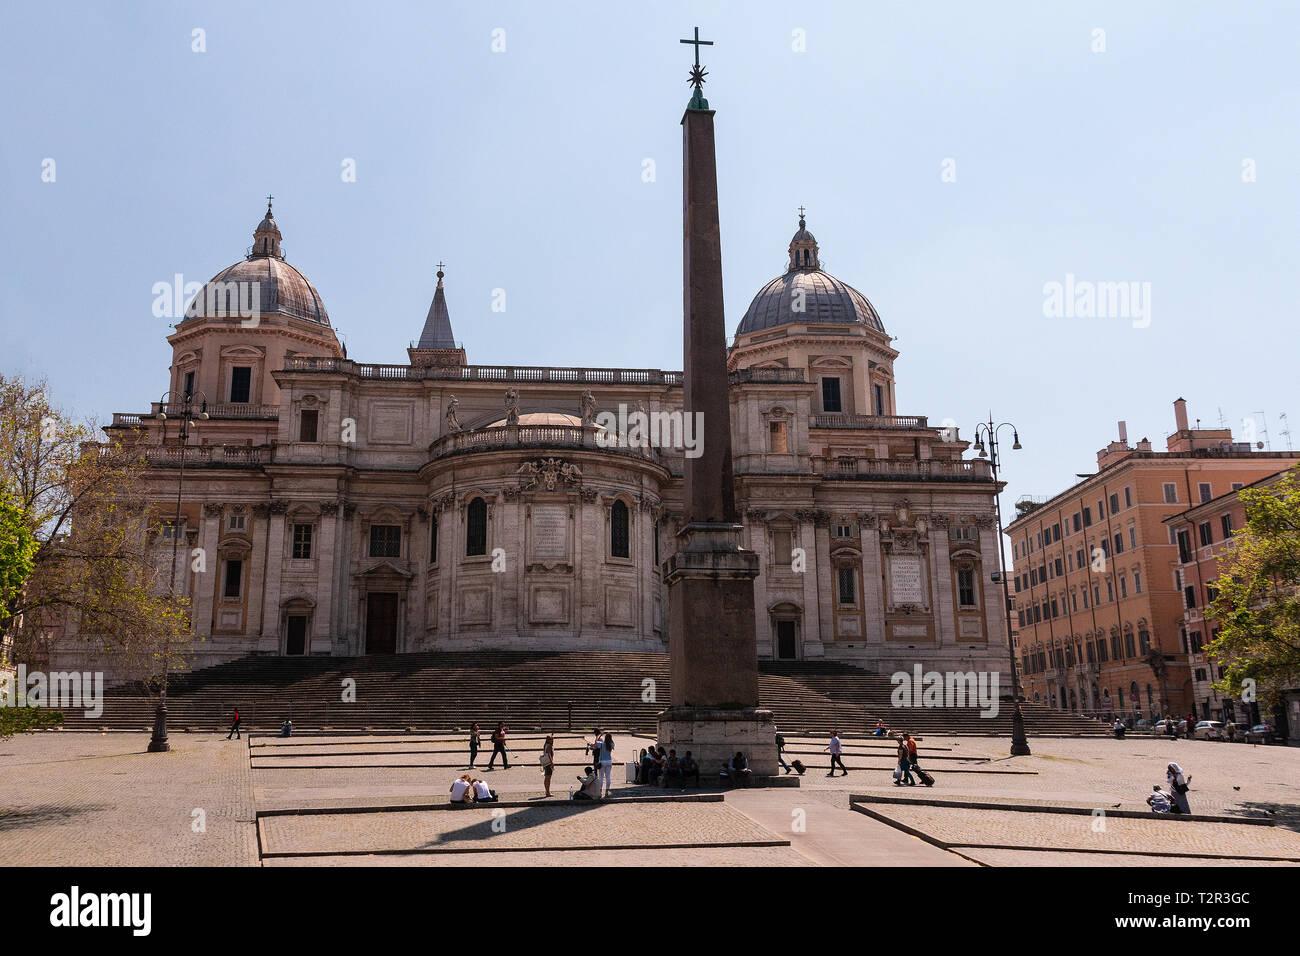 The Basilica di Santa Maria Maggiore, Basilica of Saint Mary Major, built under Celestine I (422–432) as a papal Basilica now of diplomatic immunity. - Stock Image